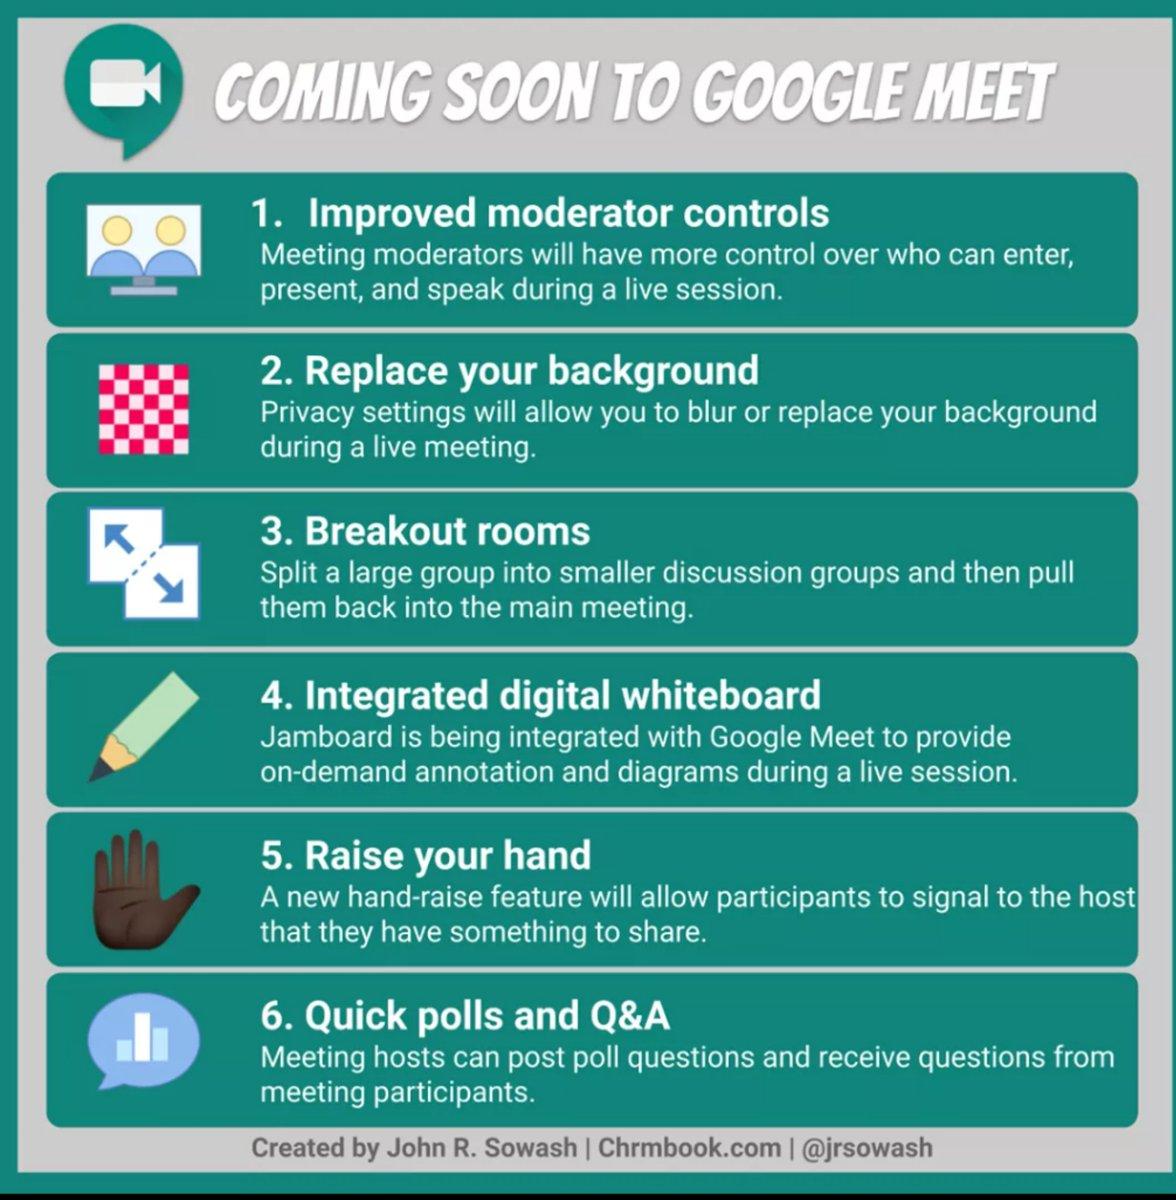 Love these new #GoogleEdu Google Meet updates! Thanks for the graphic @jrsowash